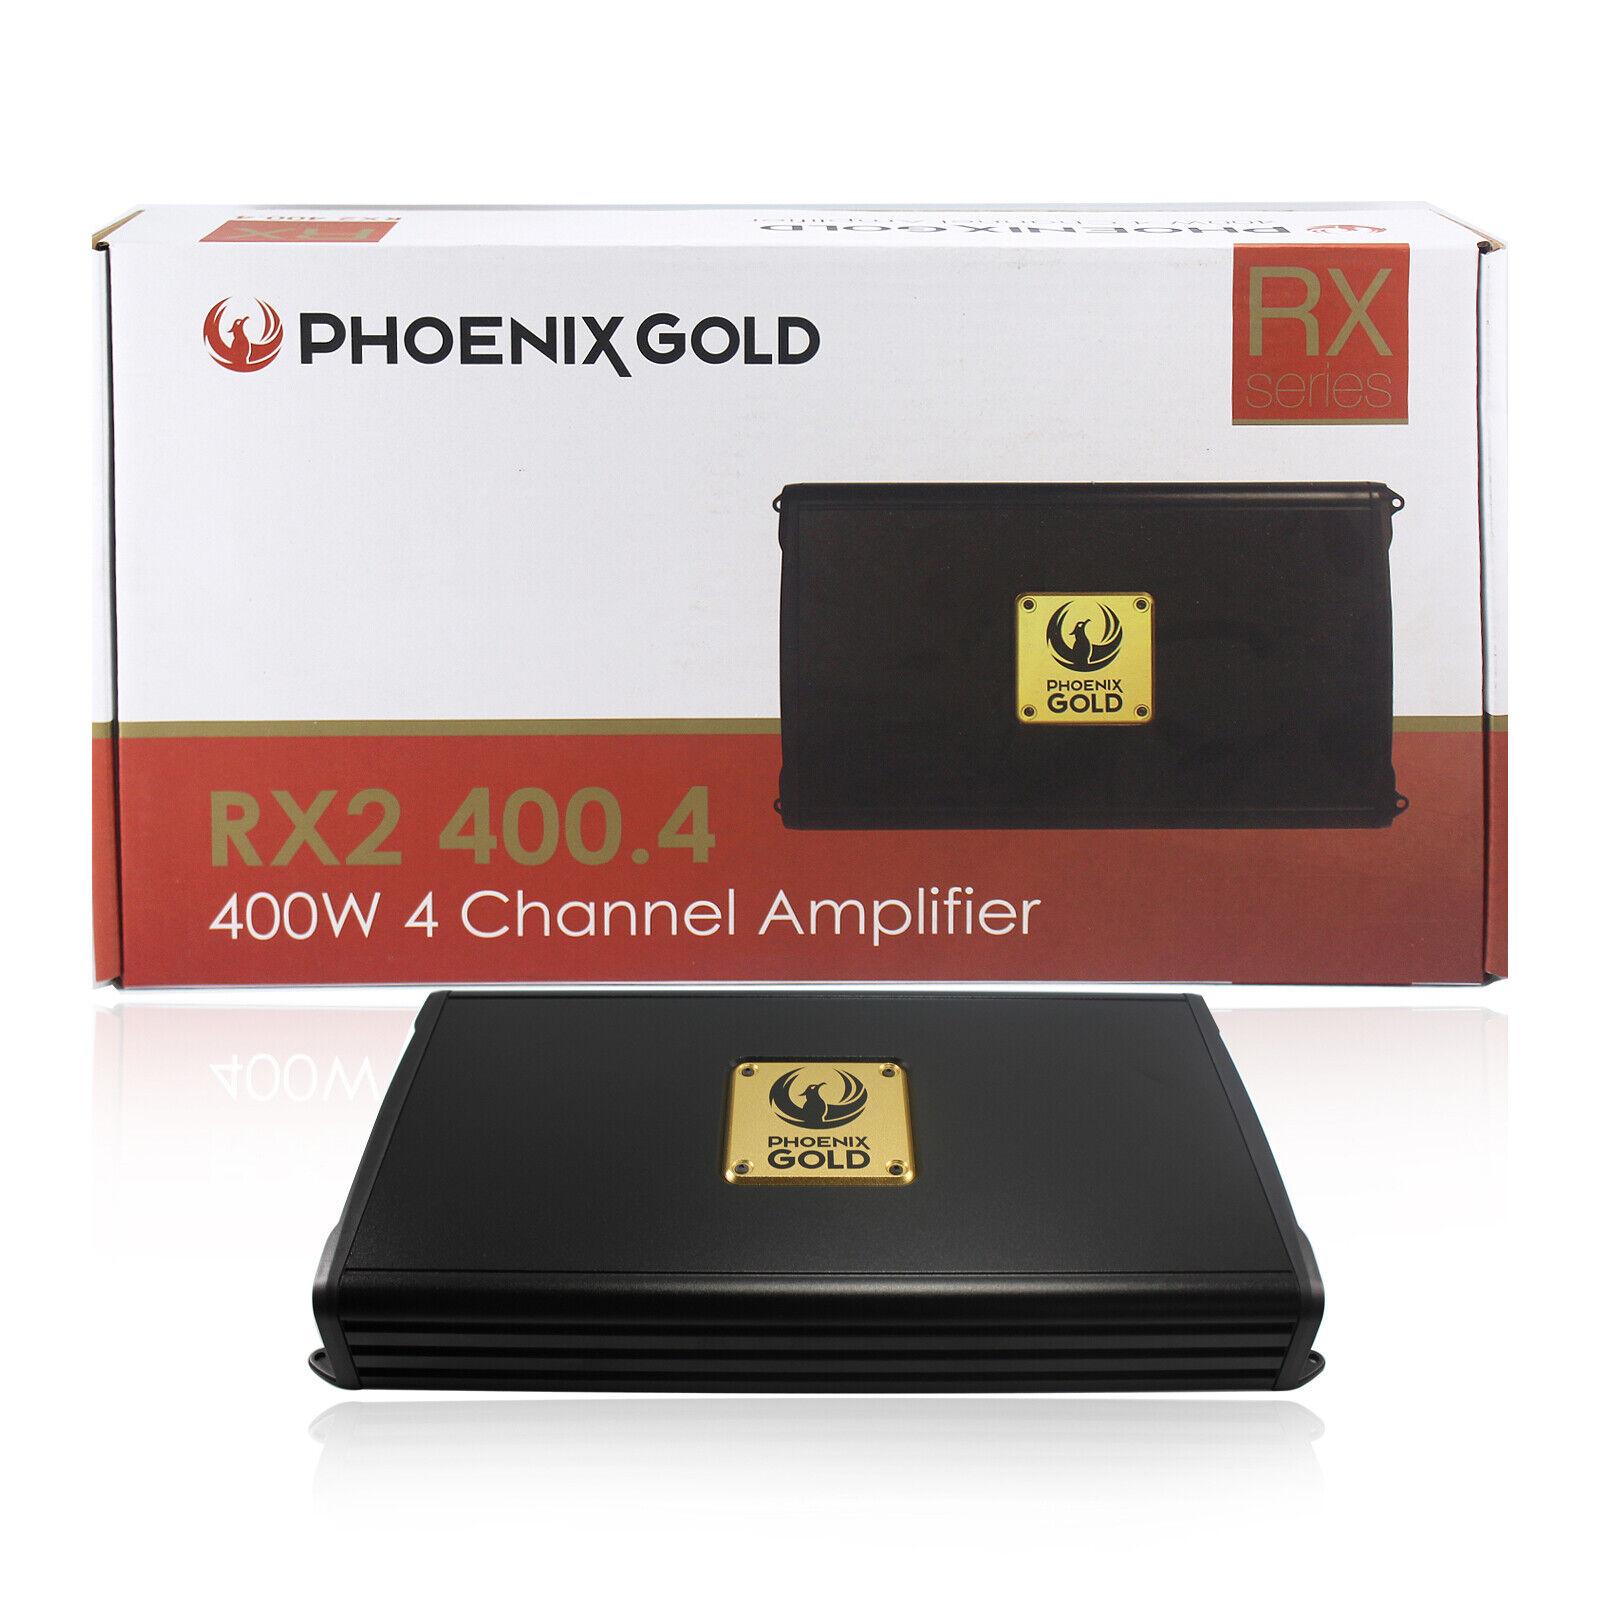 Trane Amer Standard Defrost Sensor THT2341 THT02341 доставка с eBay